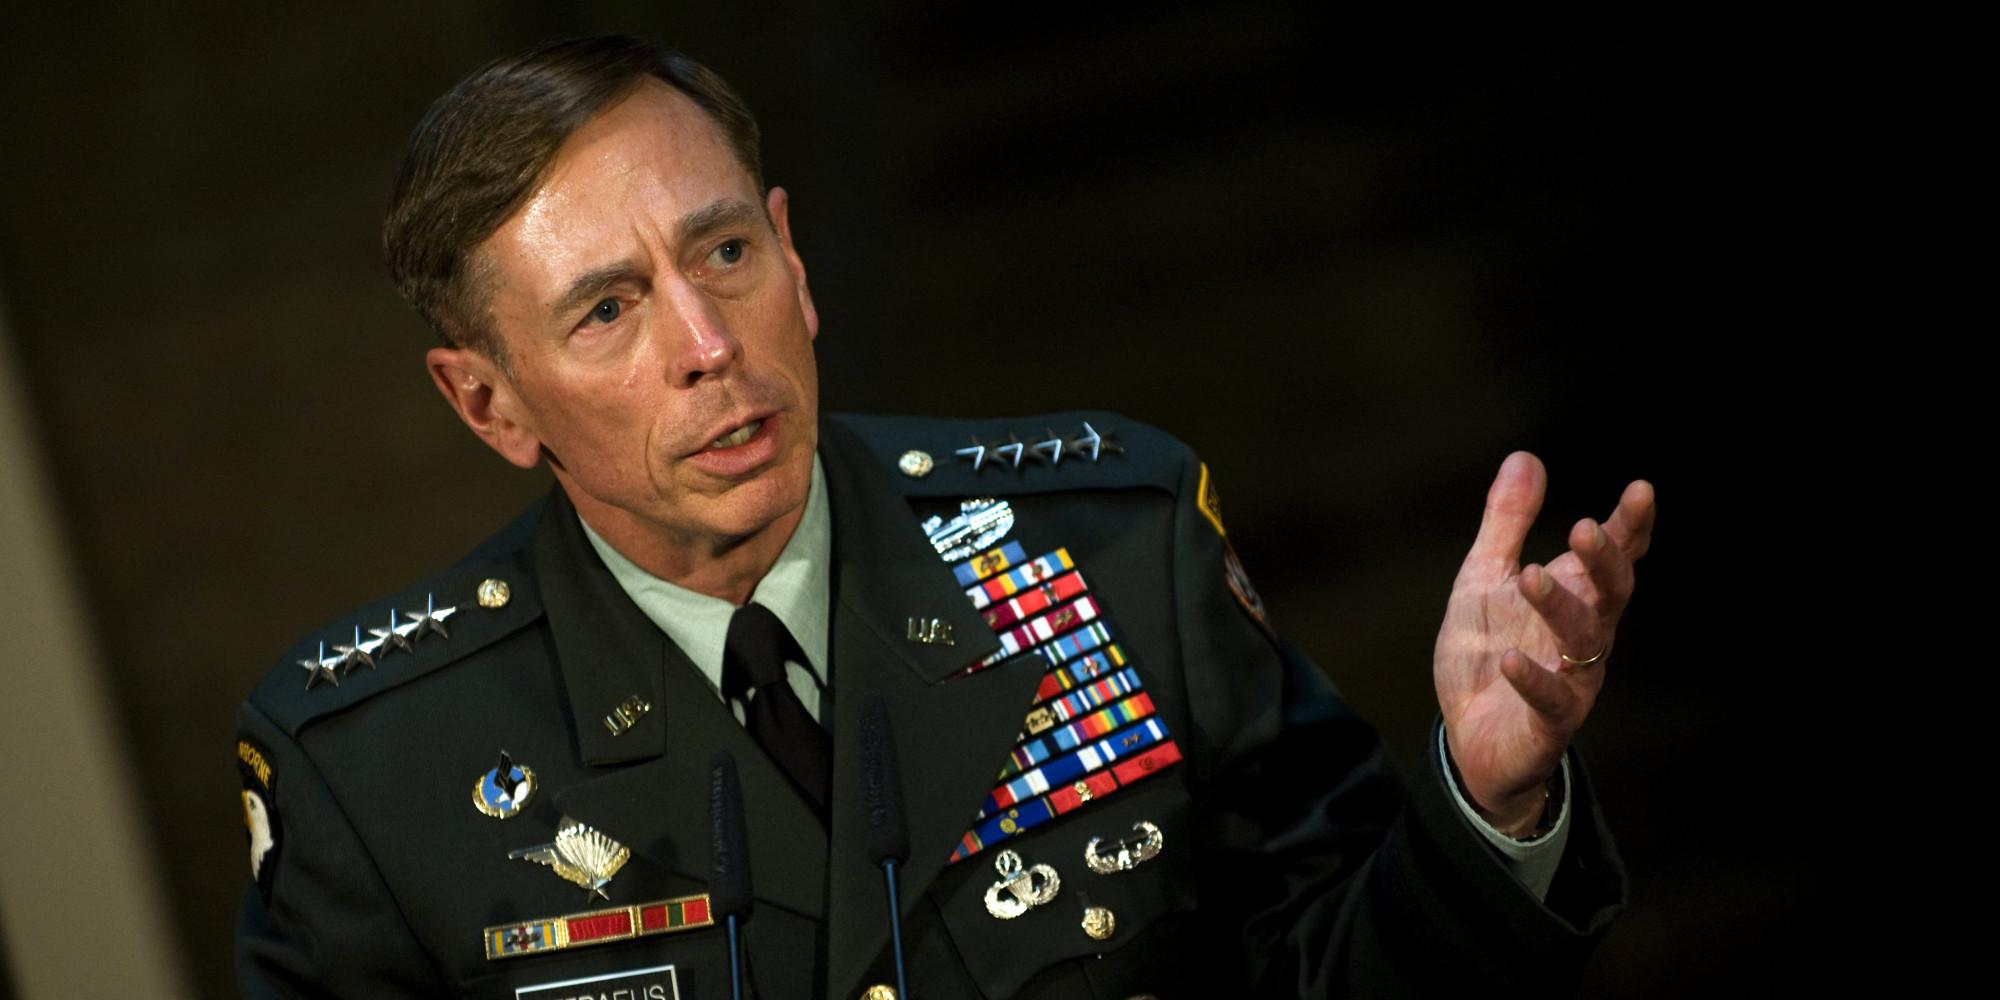 Dave Petraeus, national hero